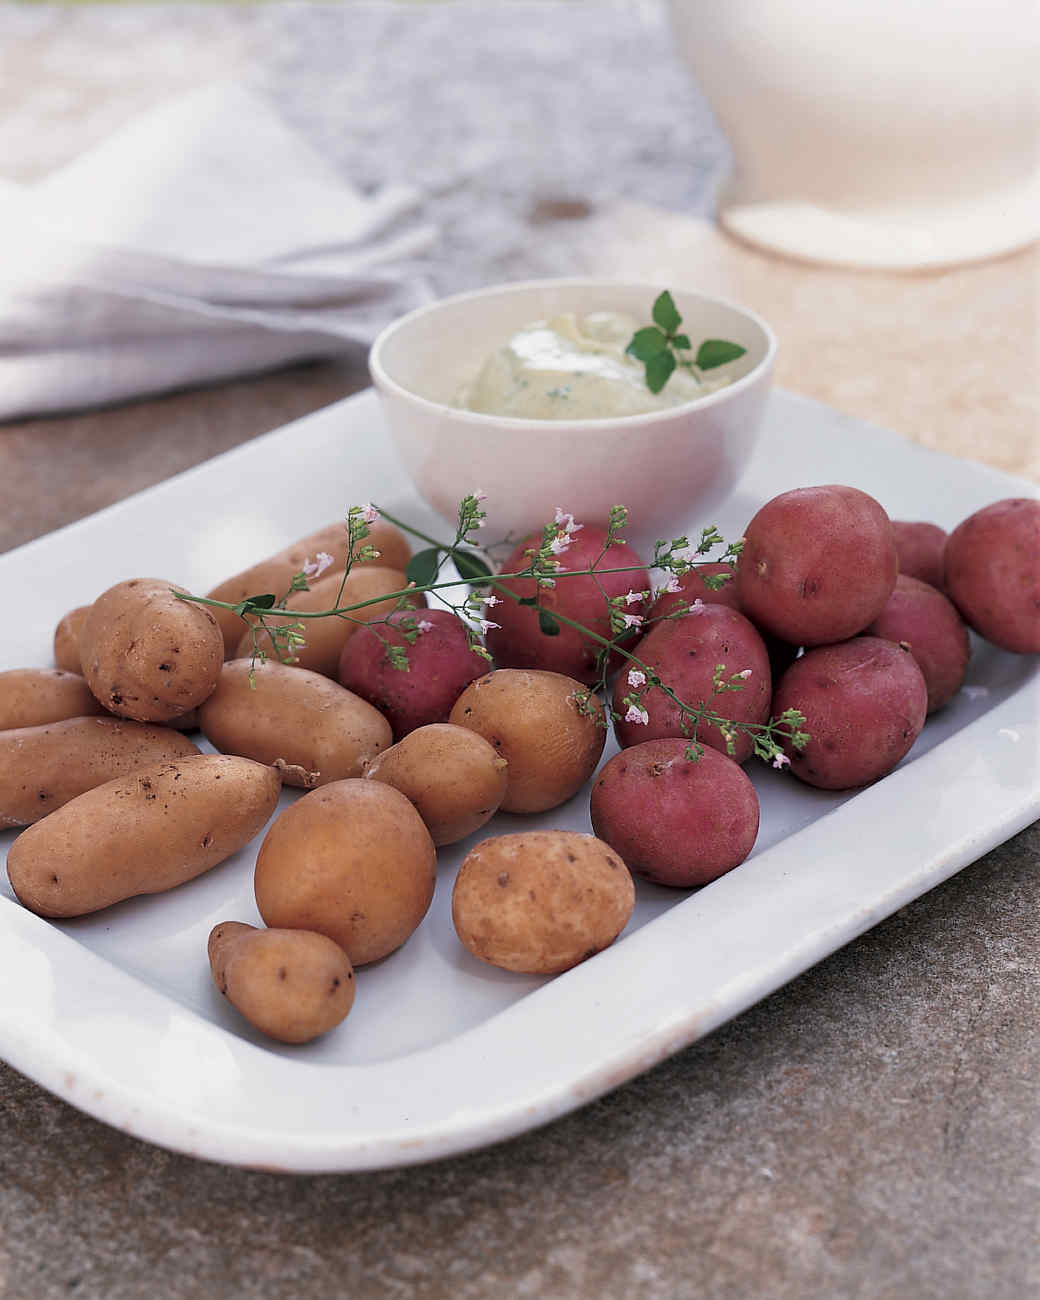 qc_0600_potatoes.jpg